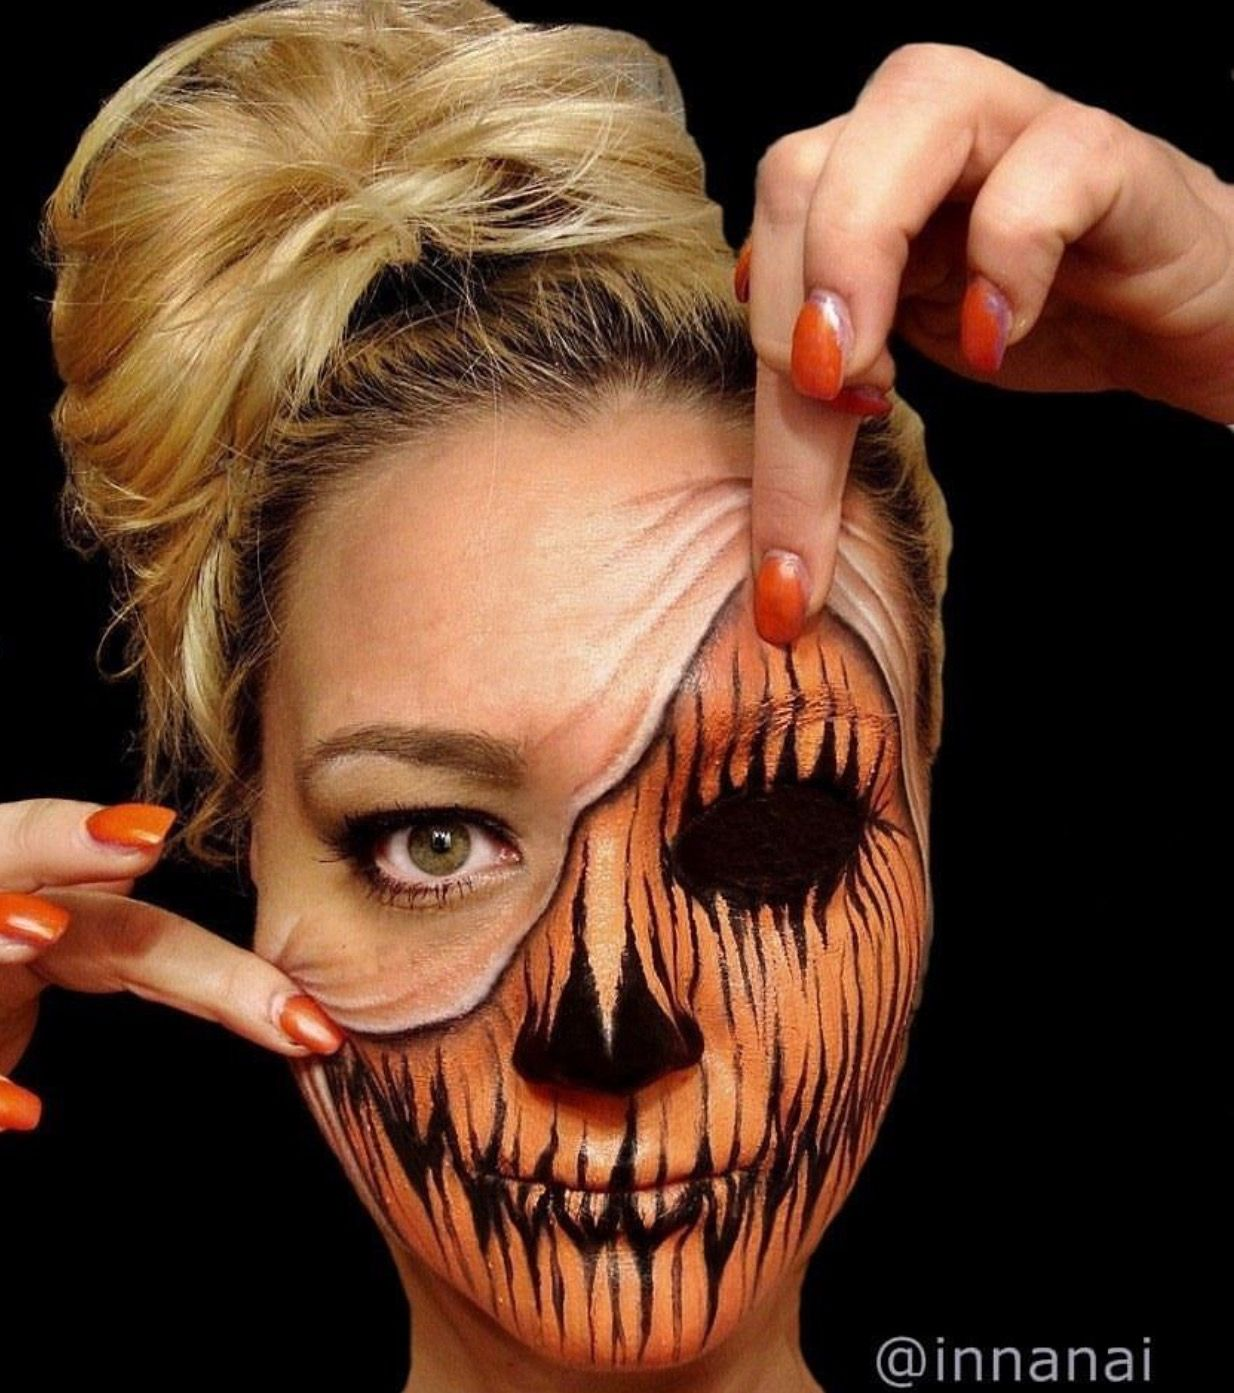 Pumpkin makeup by @innanai | All About Makeup | Pinterest | Makeup ...